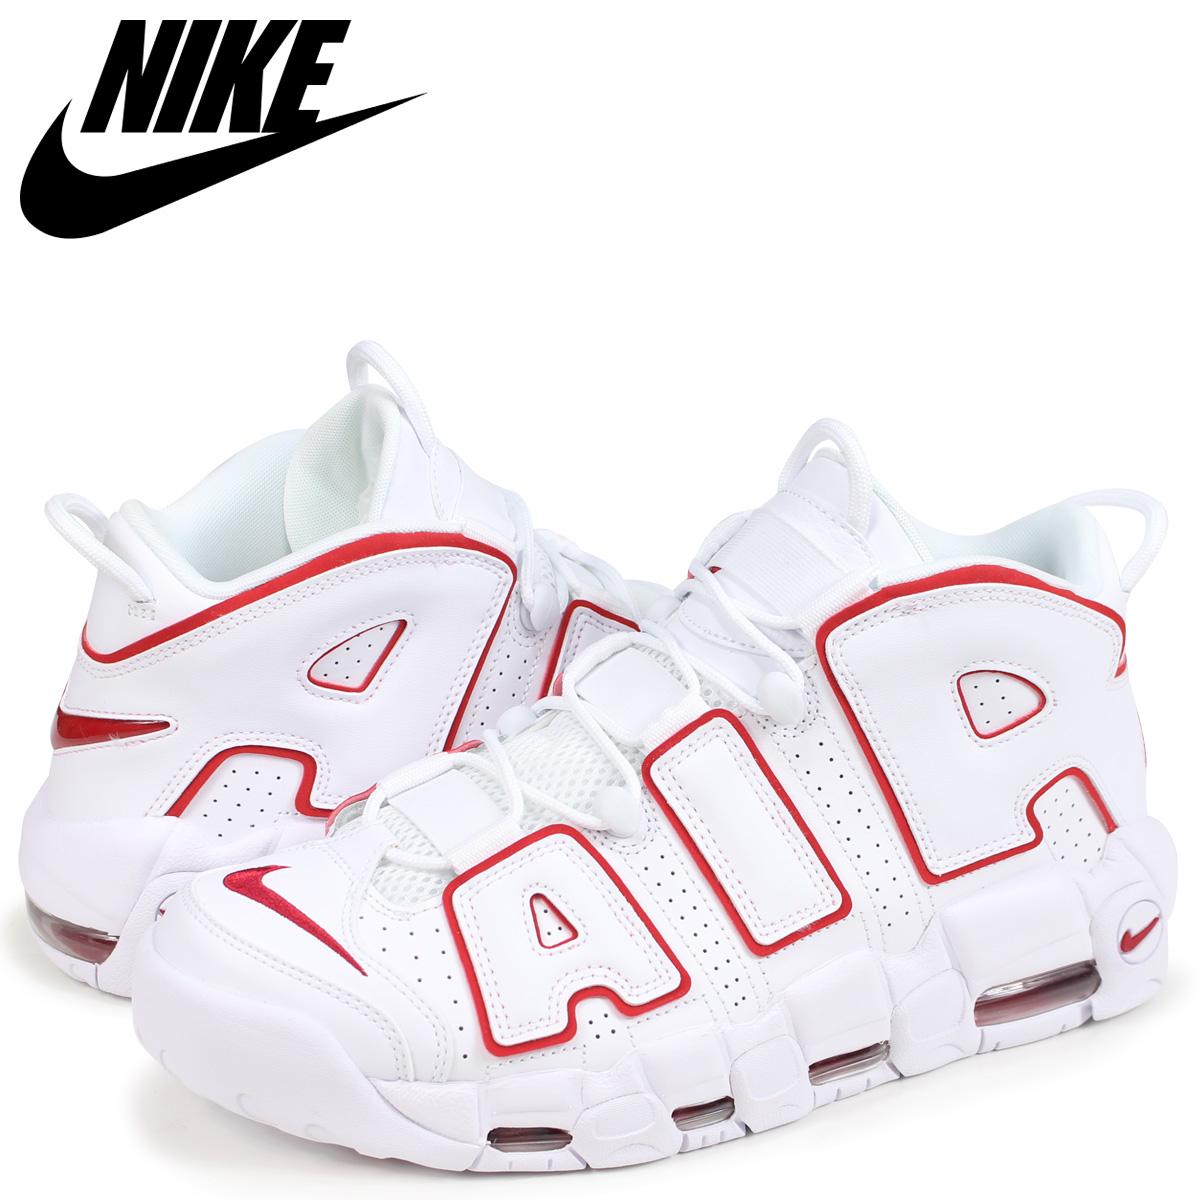 wholesale dealer 345d2 0de51 NIKE Nike air more up tempo sneakers men AIR MORE UPTEMPO 96 921,948-102  white